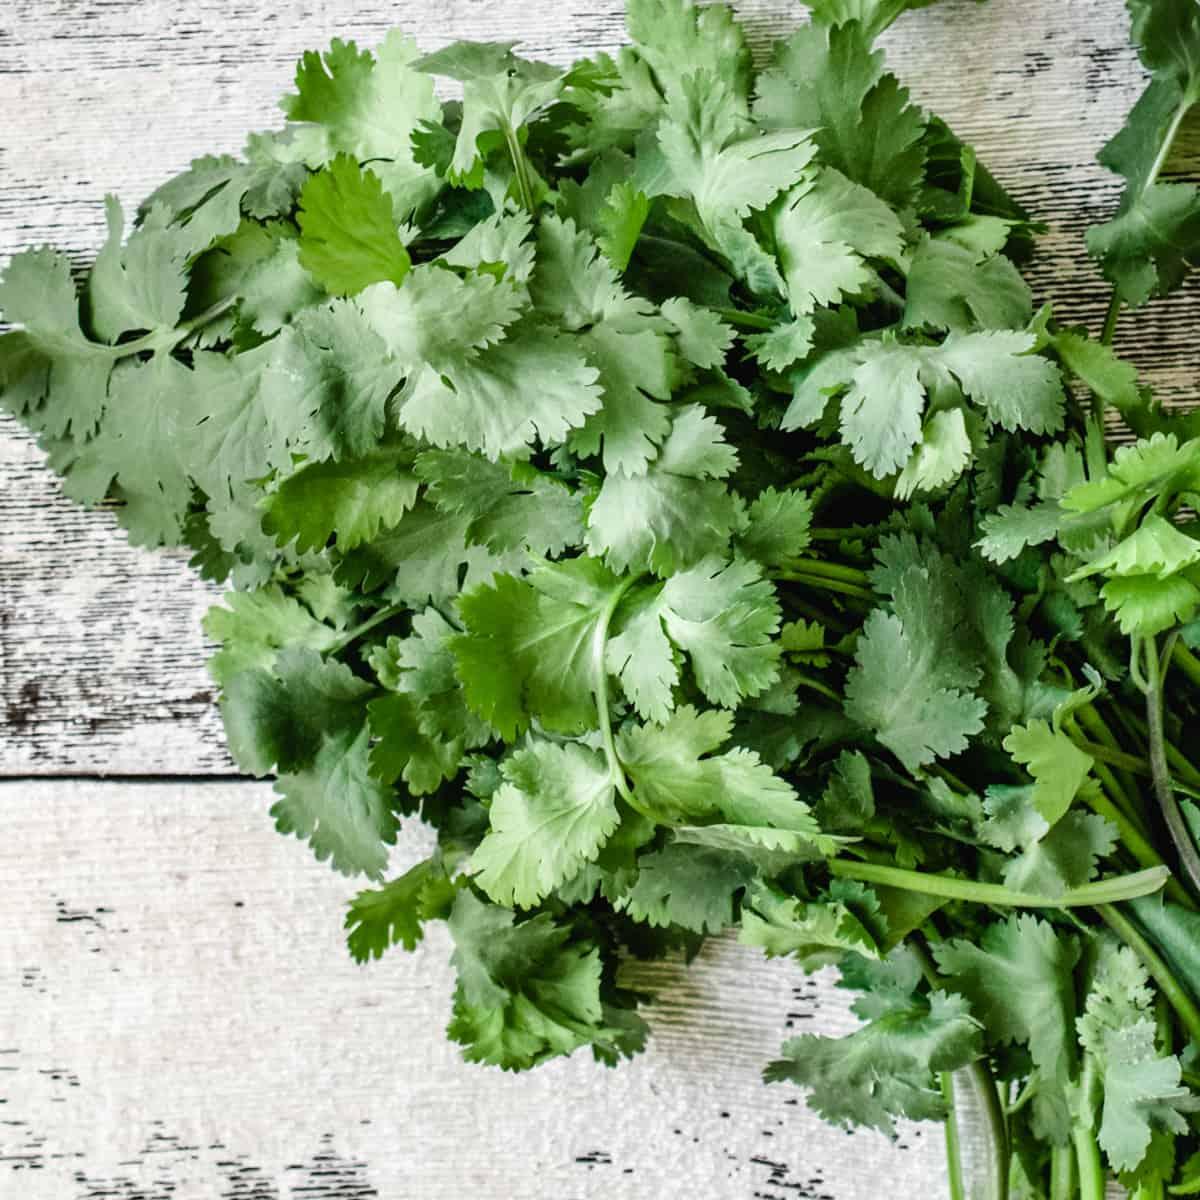 Fresh cilantro bundle on distressed white wooden background.